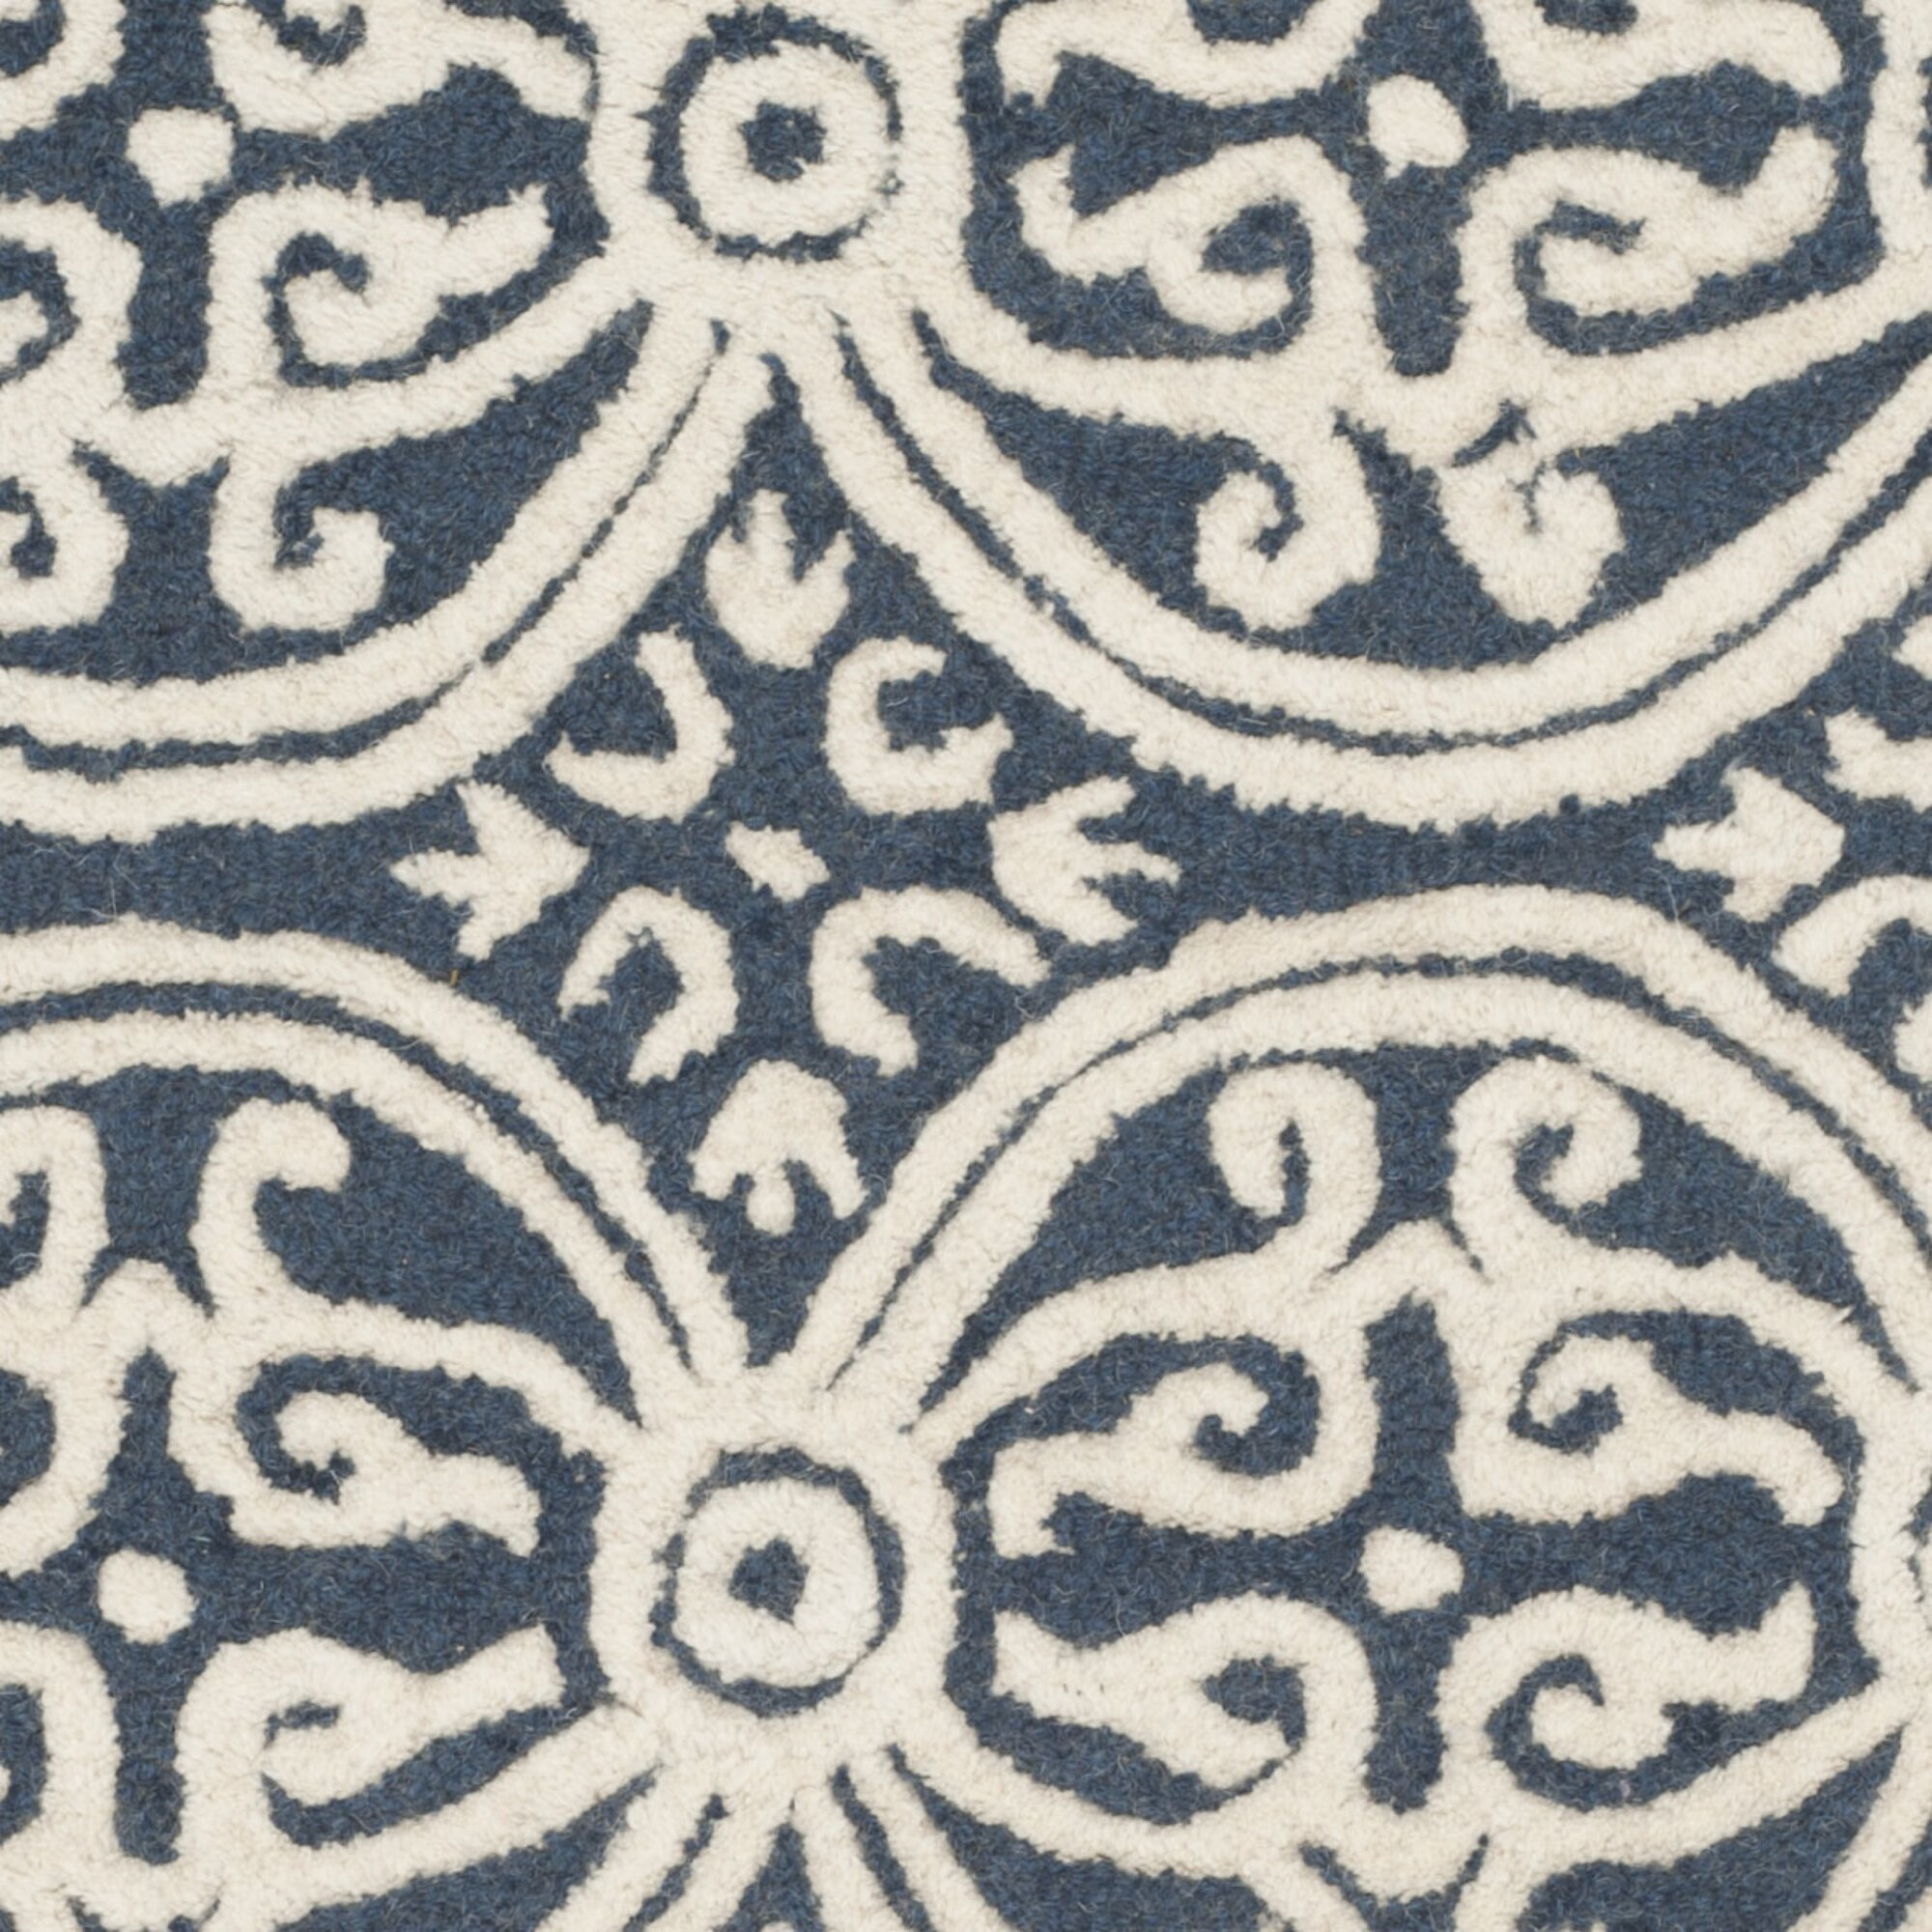 and on rug main joss wayfair area rugs gallery diners best pinterest haven bedrooms htm of images teal bedroom